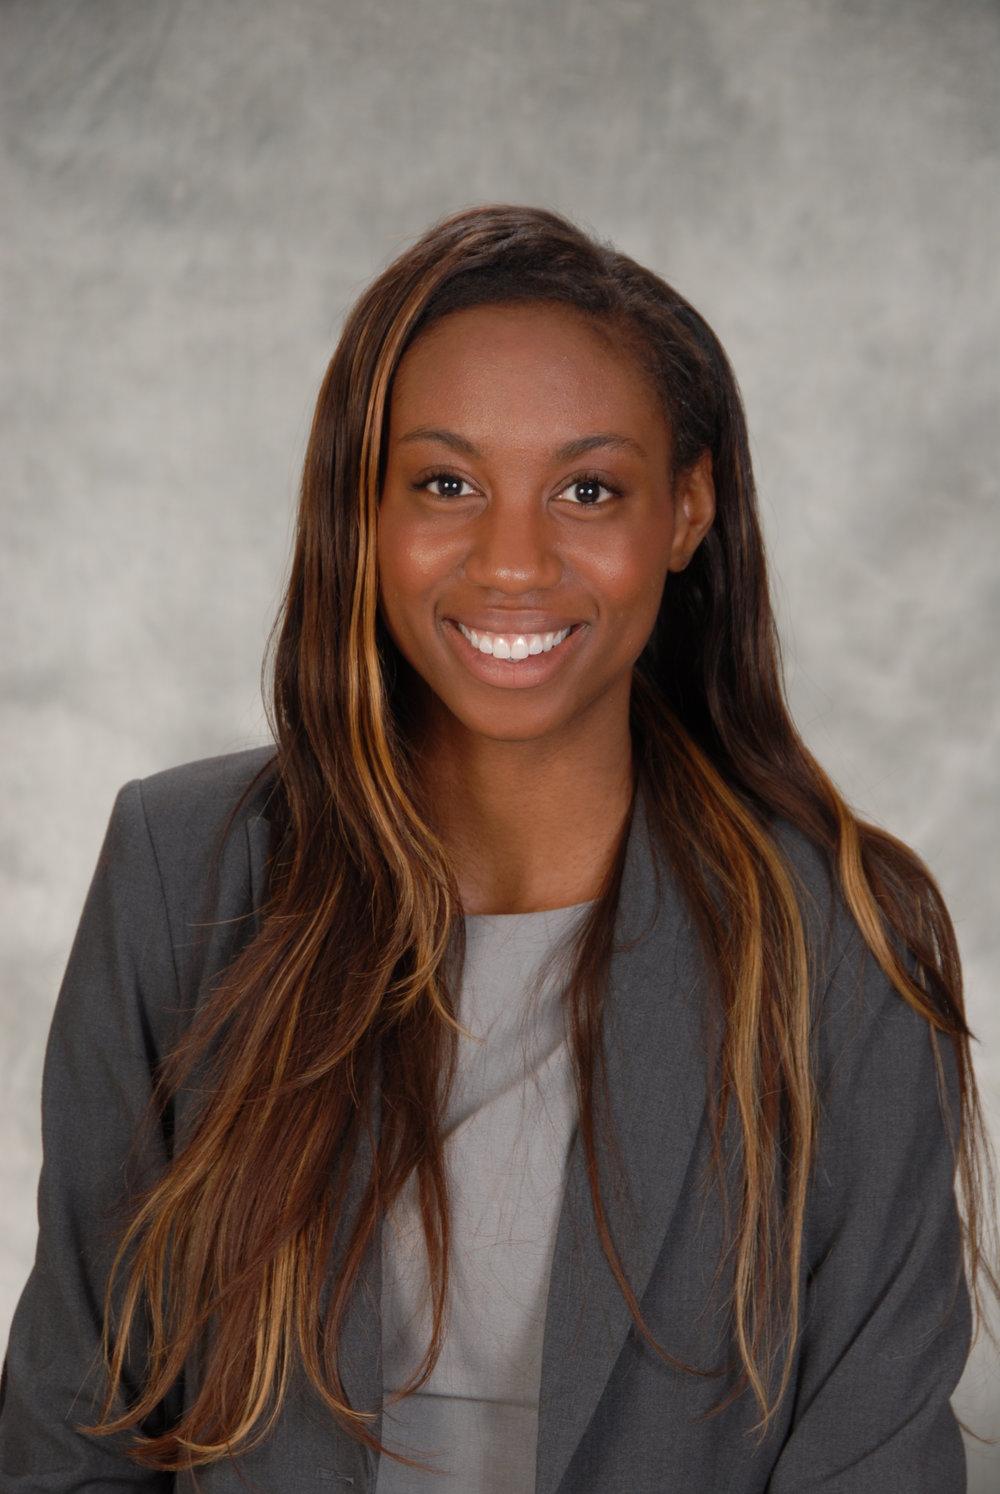 Jillian Ross - VP of Student Wellness